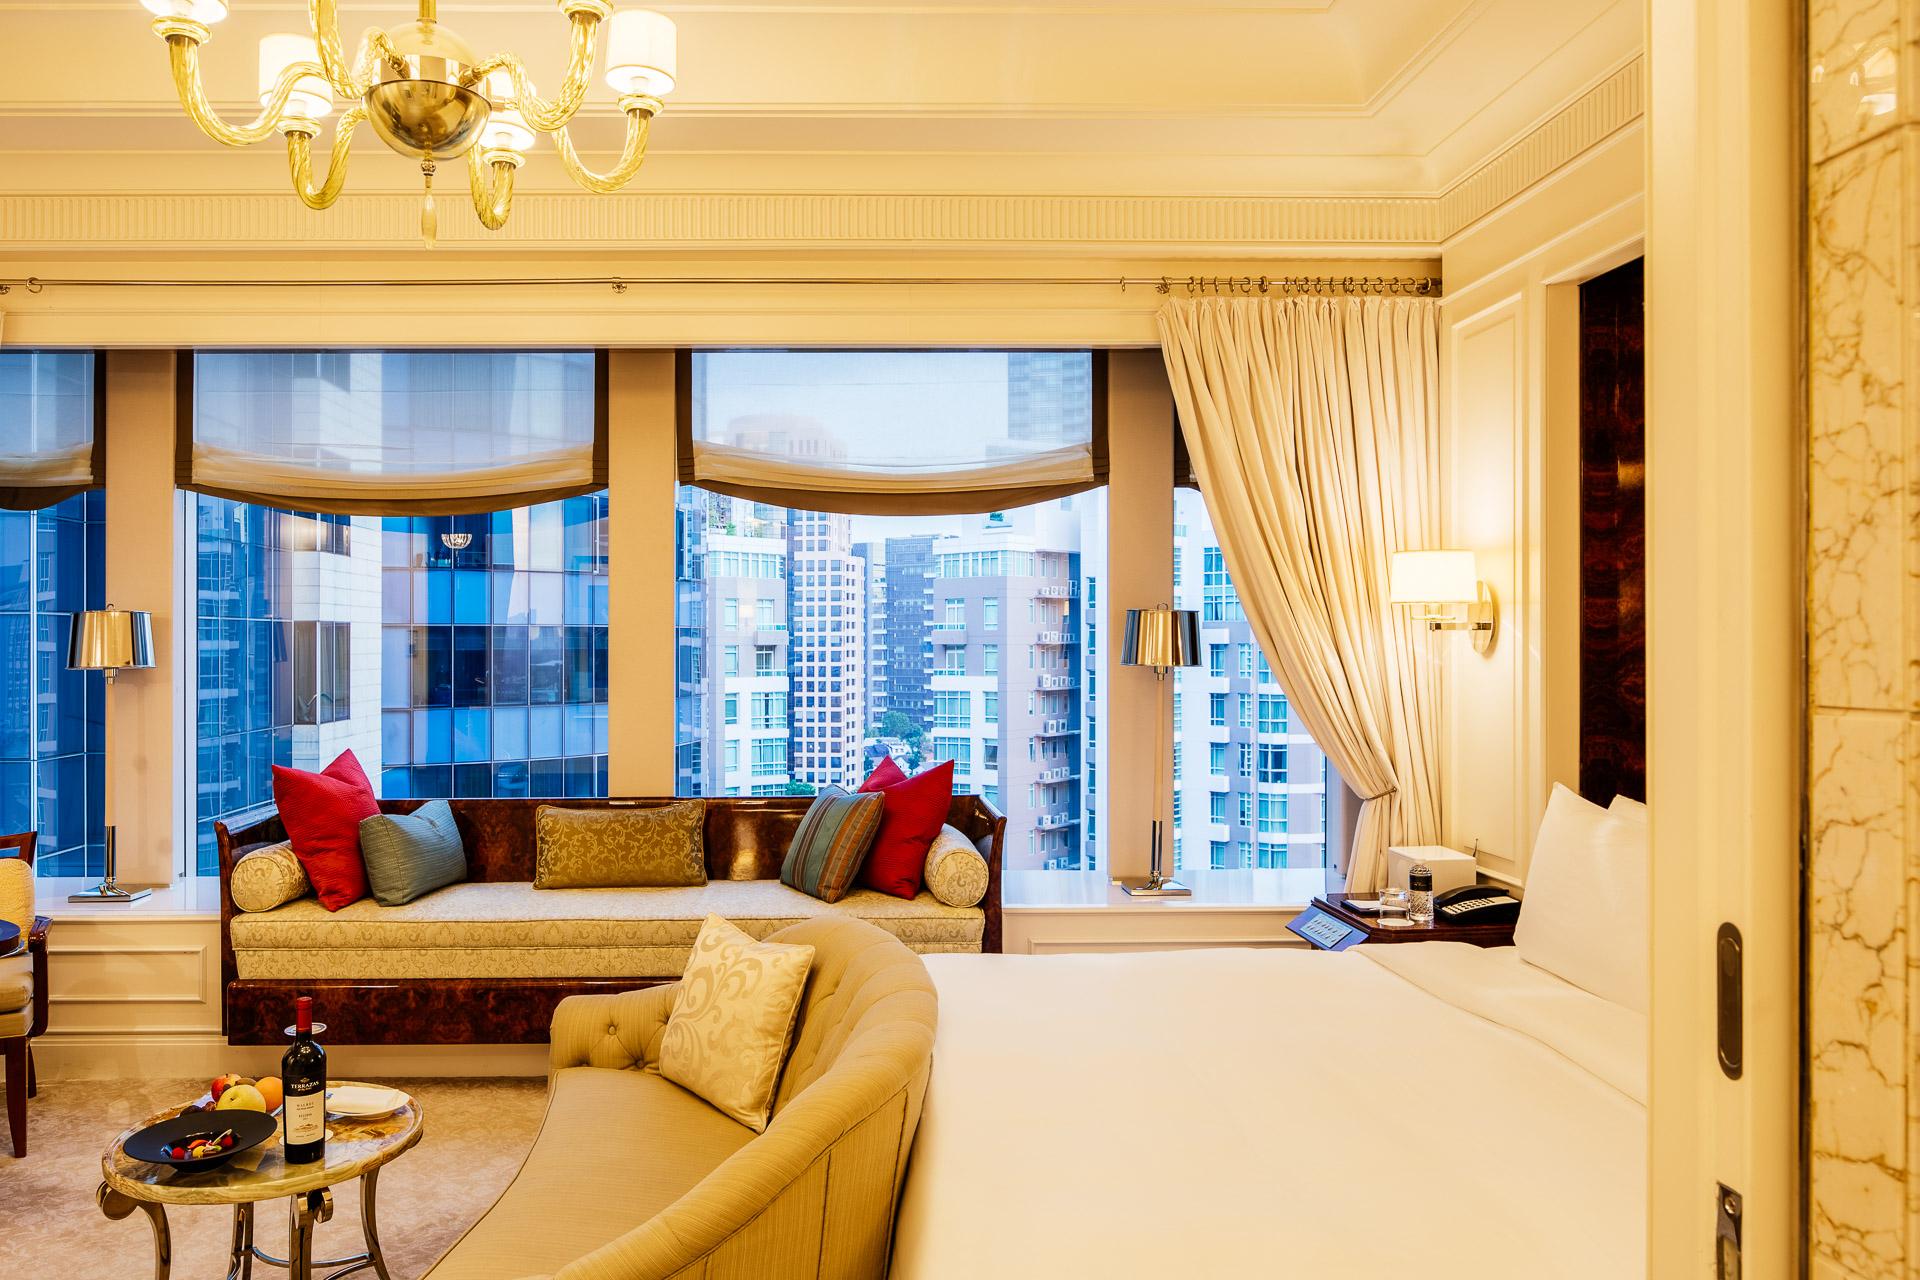 st-regis-singapore-marriott-luxury-hotel-photographer-2.jpg